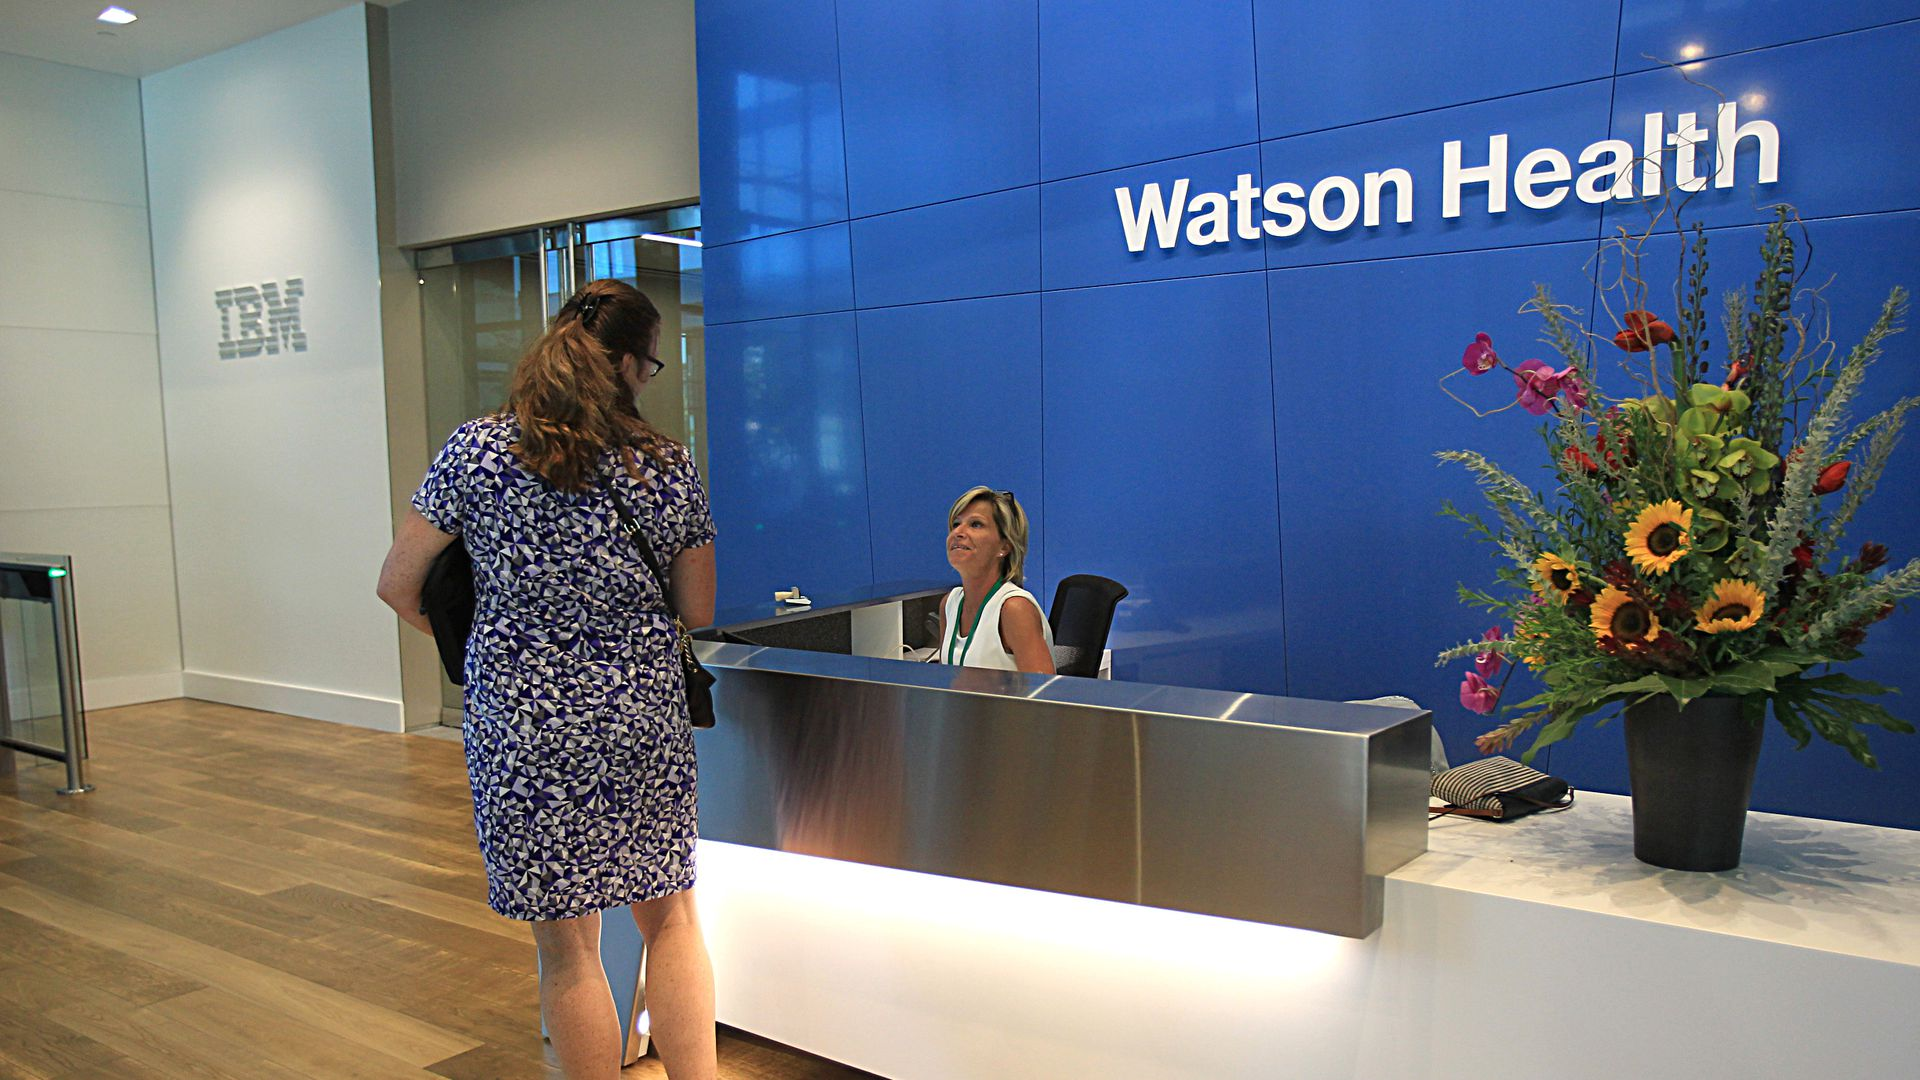 Two women in the lobby of IBM Watson Health headquarters in Massachusetts.